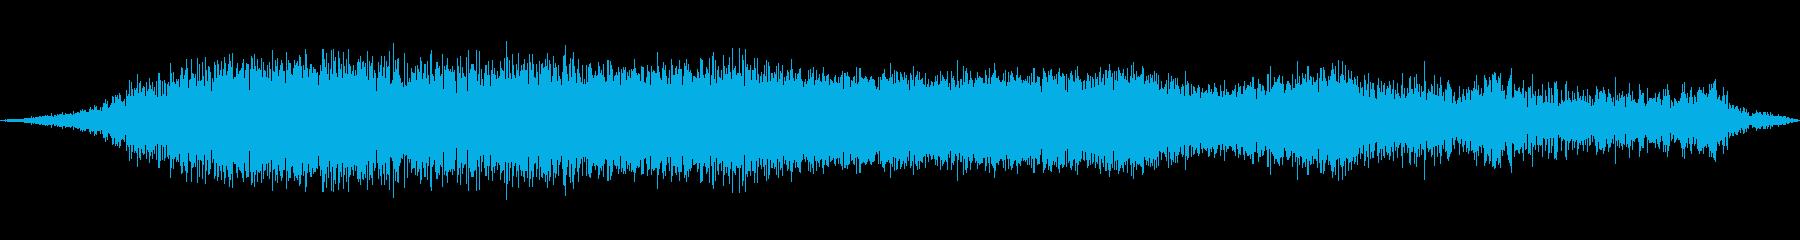 TITAN III ROCKET:...の再生済みの波形